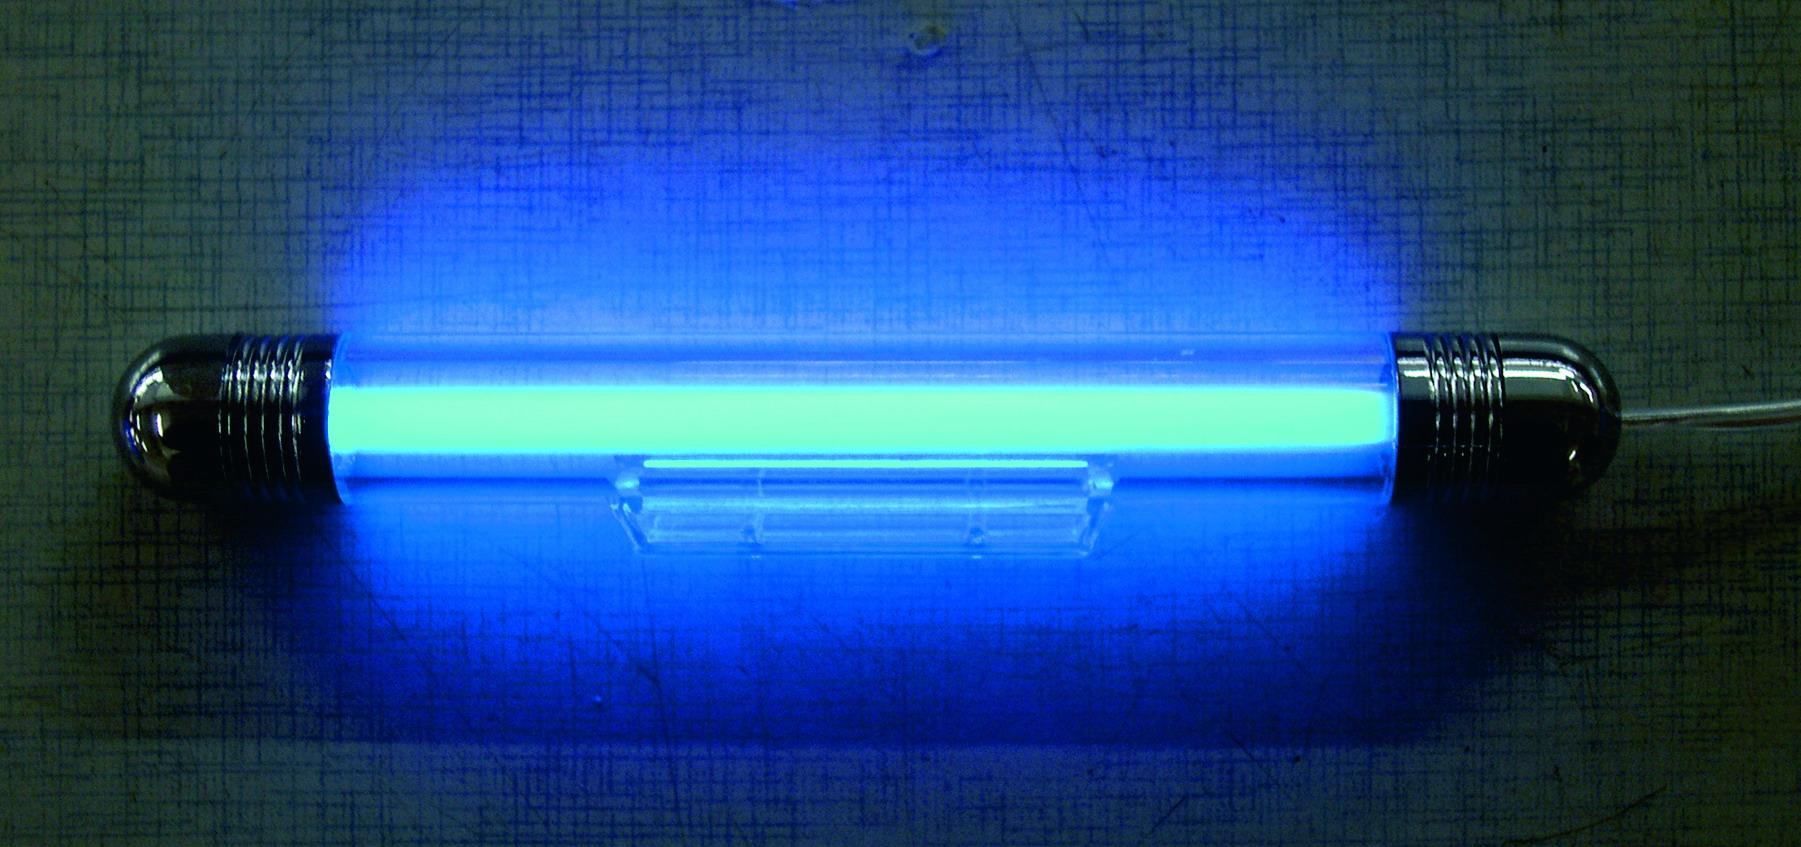 adnautomid neon tube 21cm bleu bc corona 5641. Black Bedroom Furniture Sets. Home Design Ideas